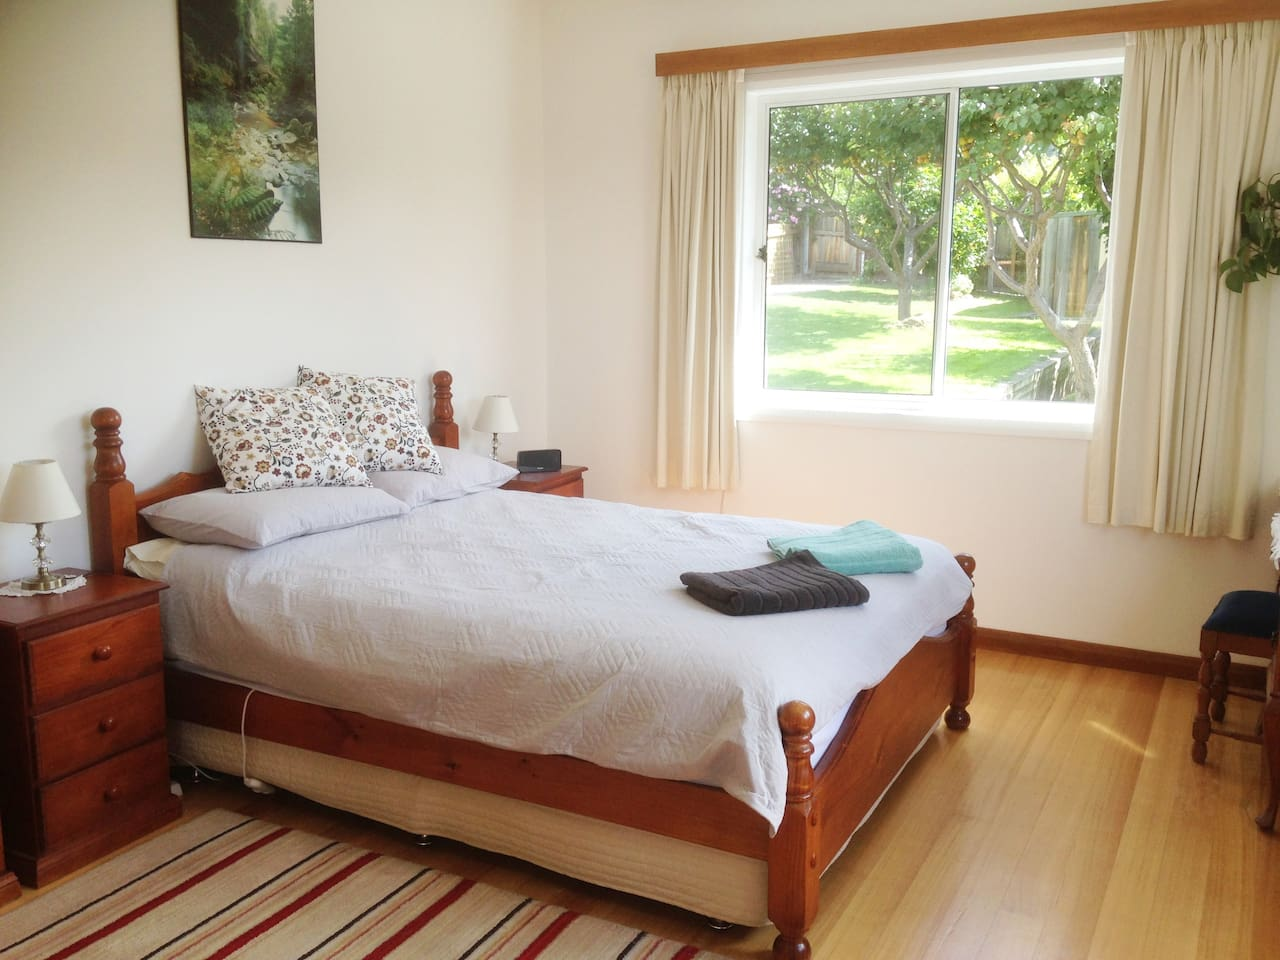 NW Bedroom Photo 1